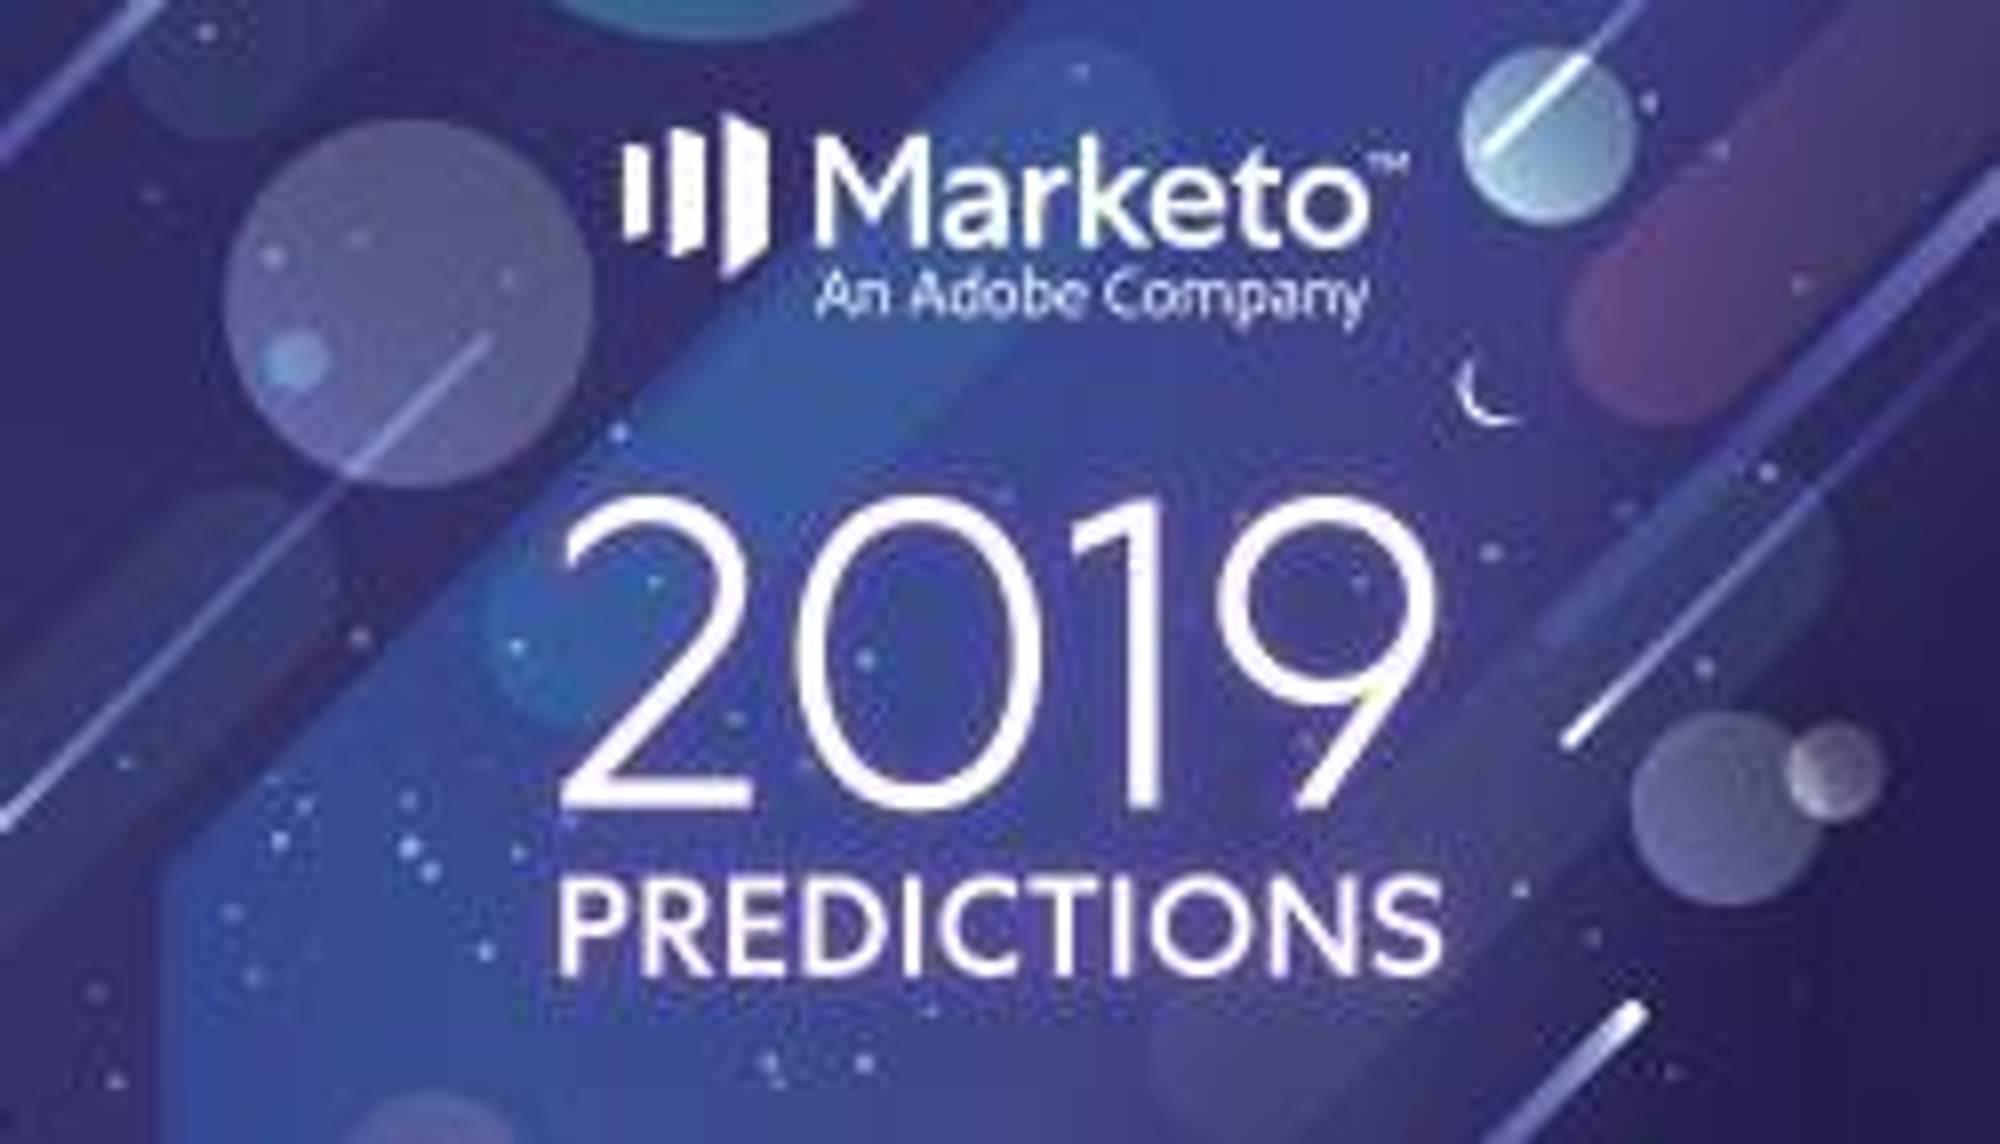 2019 Marketing Predictions